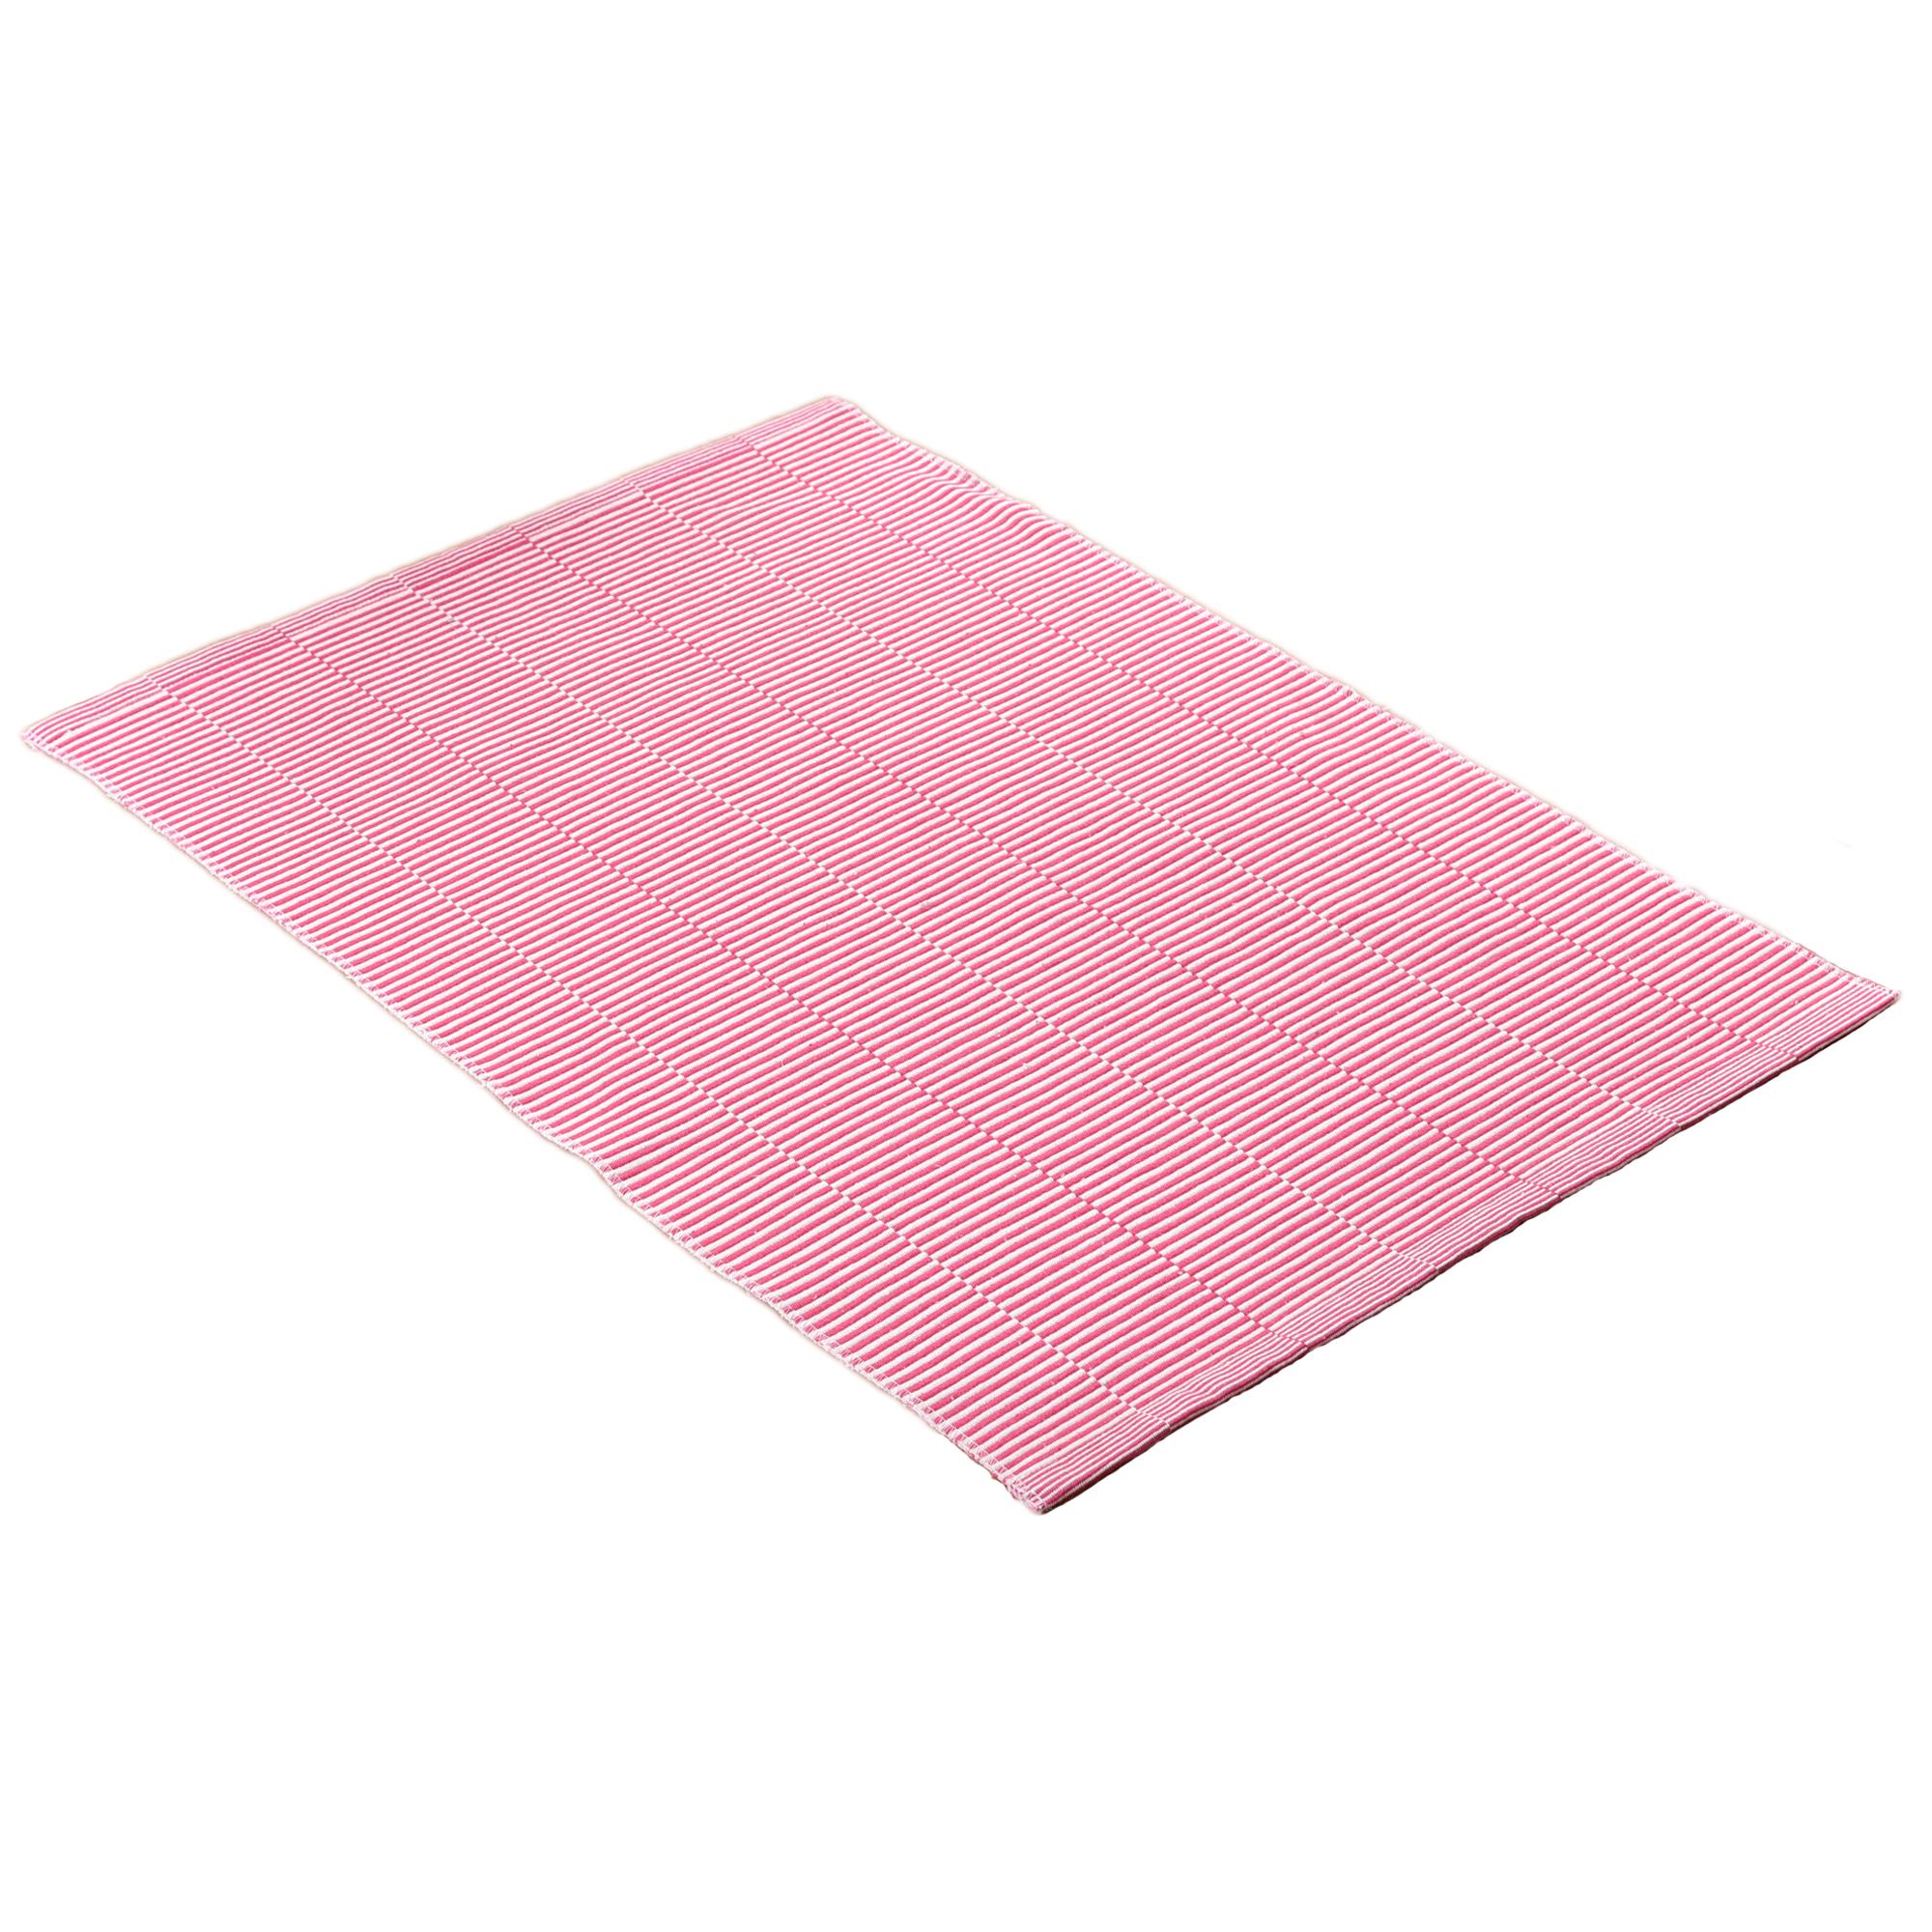 Factory Direct Modern Design Bathroom Carpet Tiles Pink Carpets For Sale Washable Floor Mat Pink And White Stripe Rug Buy Pink And White Stripe Rug Bathroom Carpet Tiles Pink Carpets For Sale Product